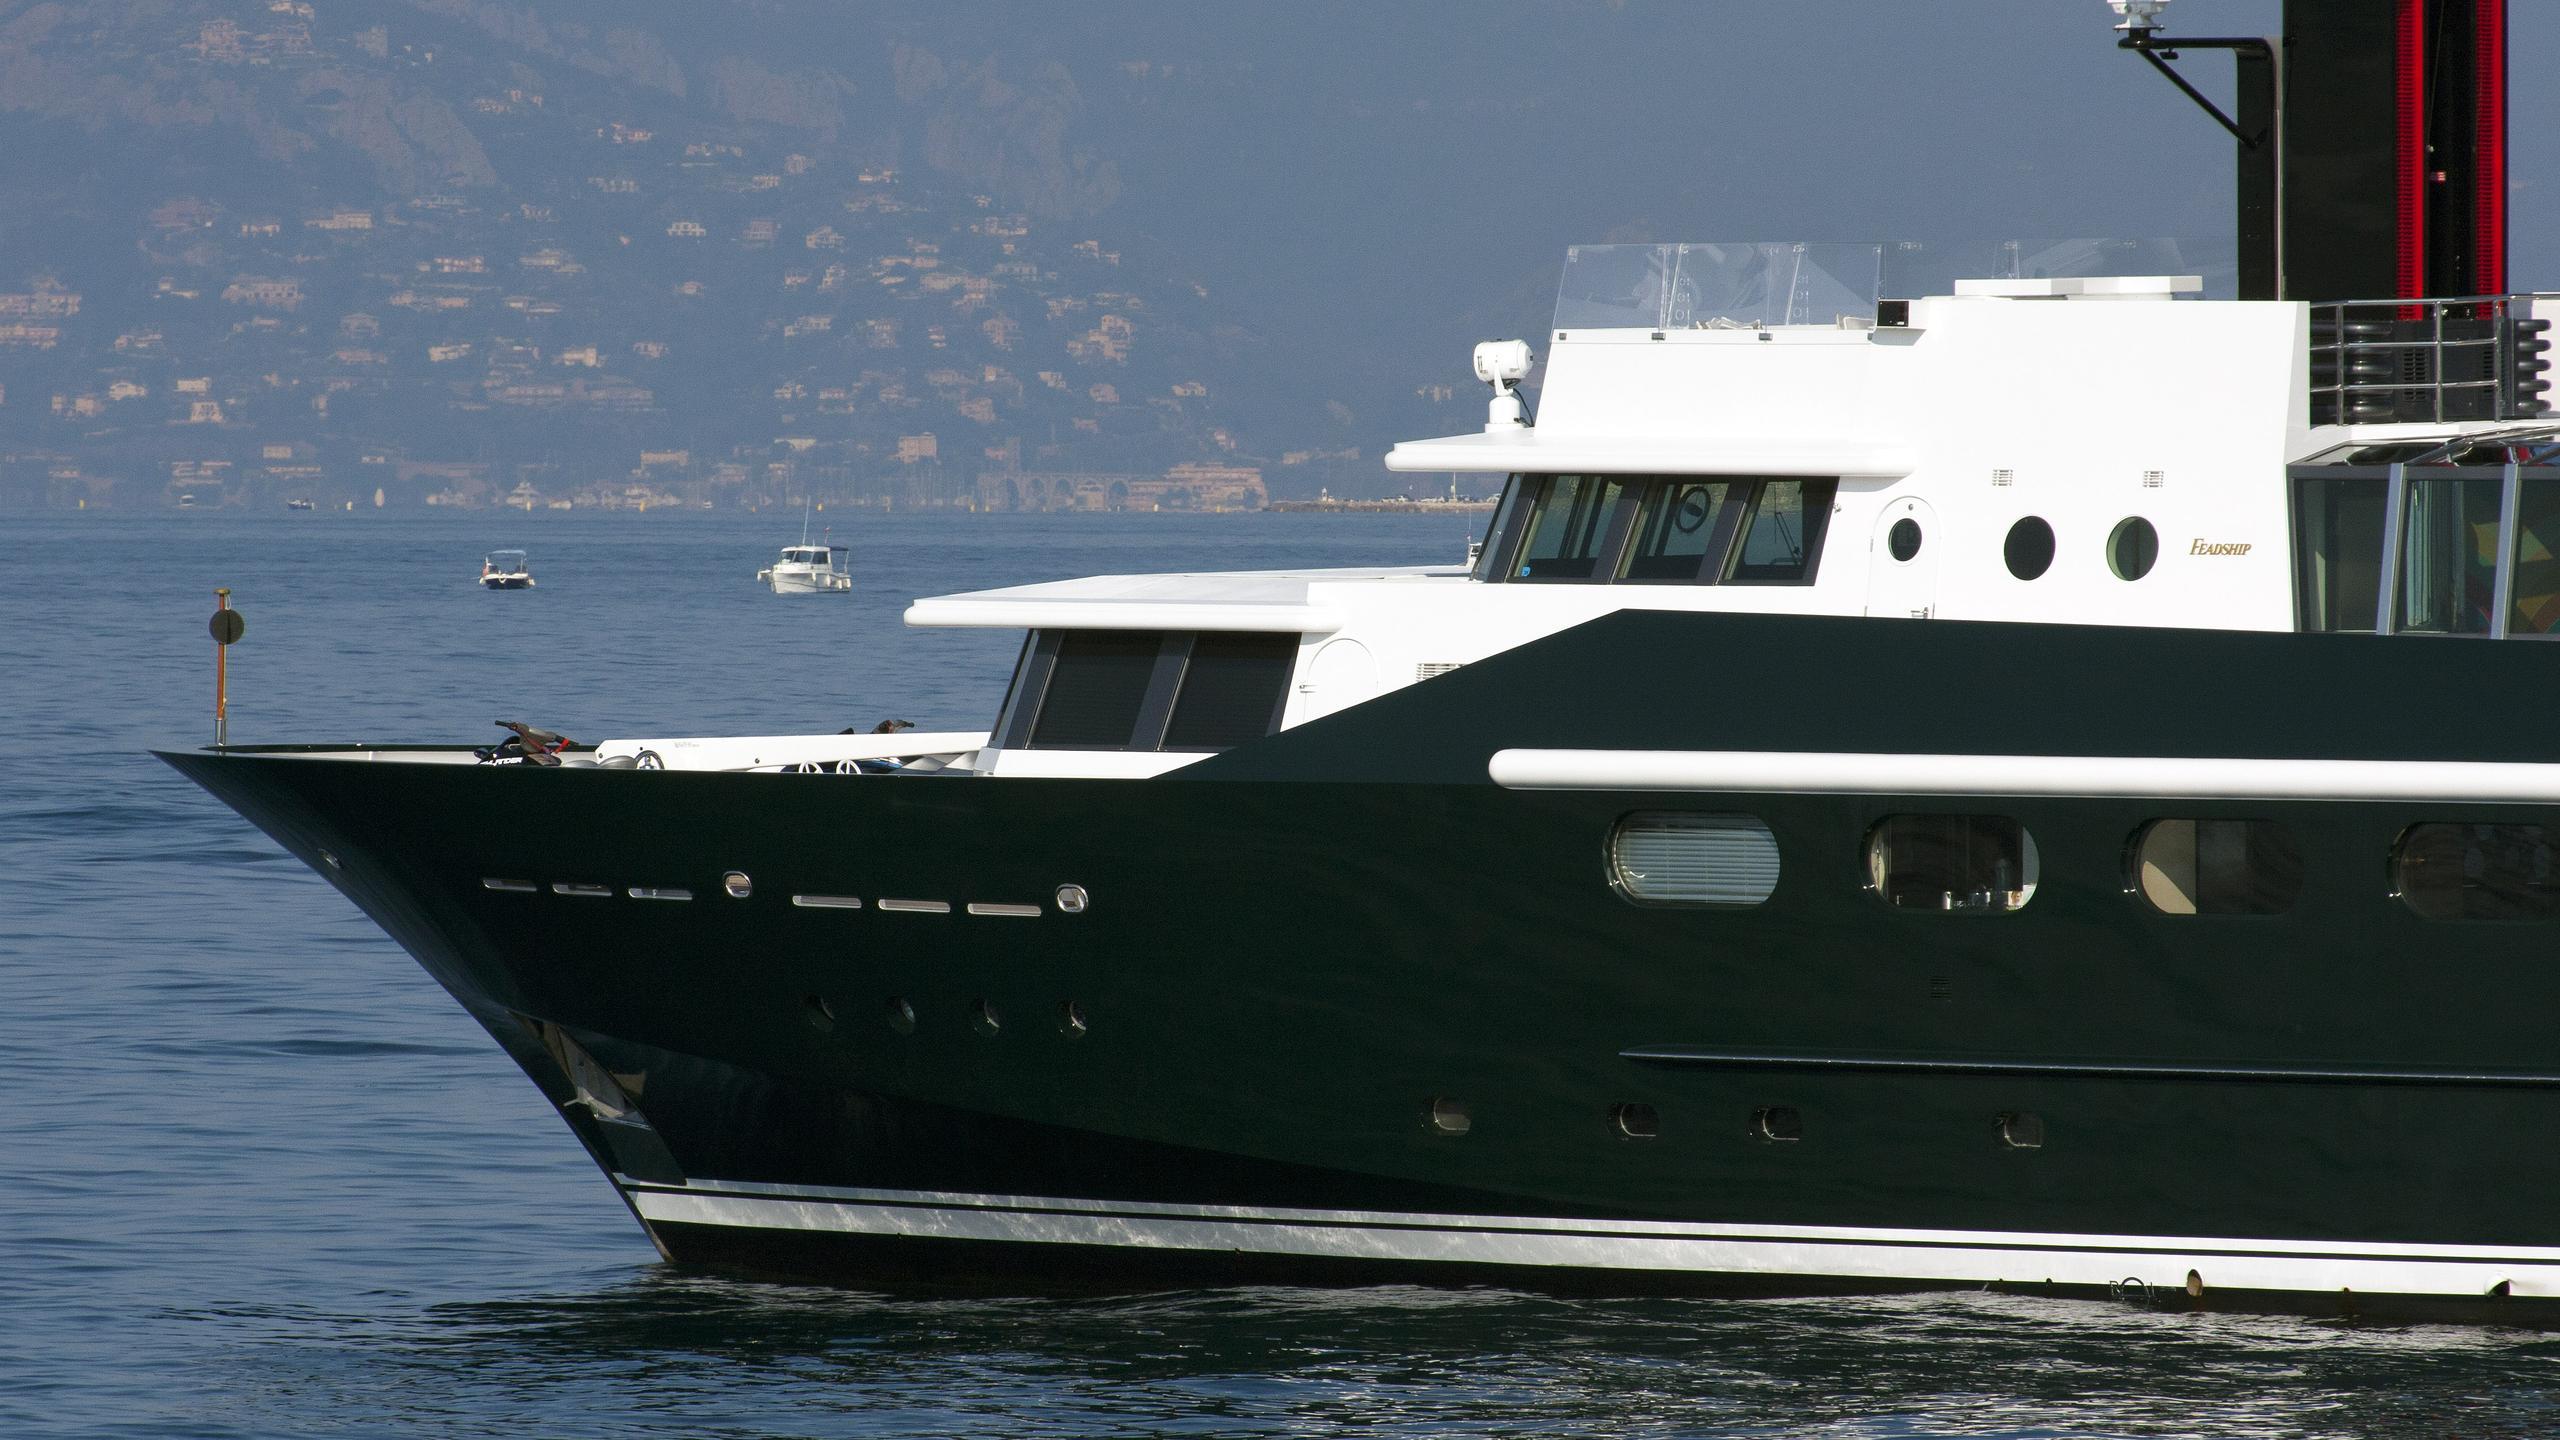 highlander-motor-yacht-feadship-1986-50m-bow-details